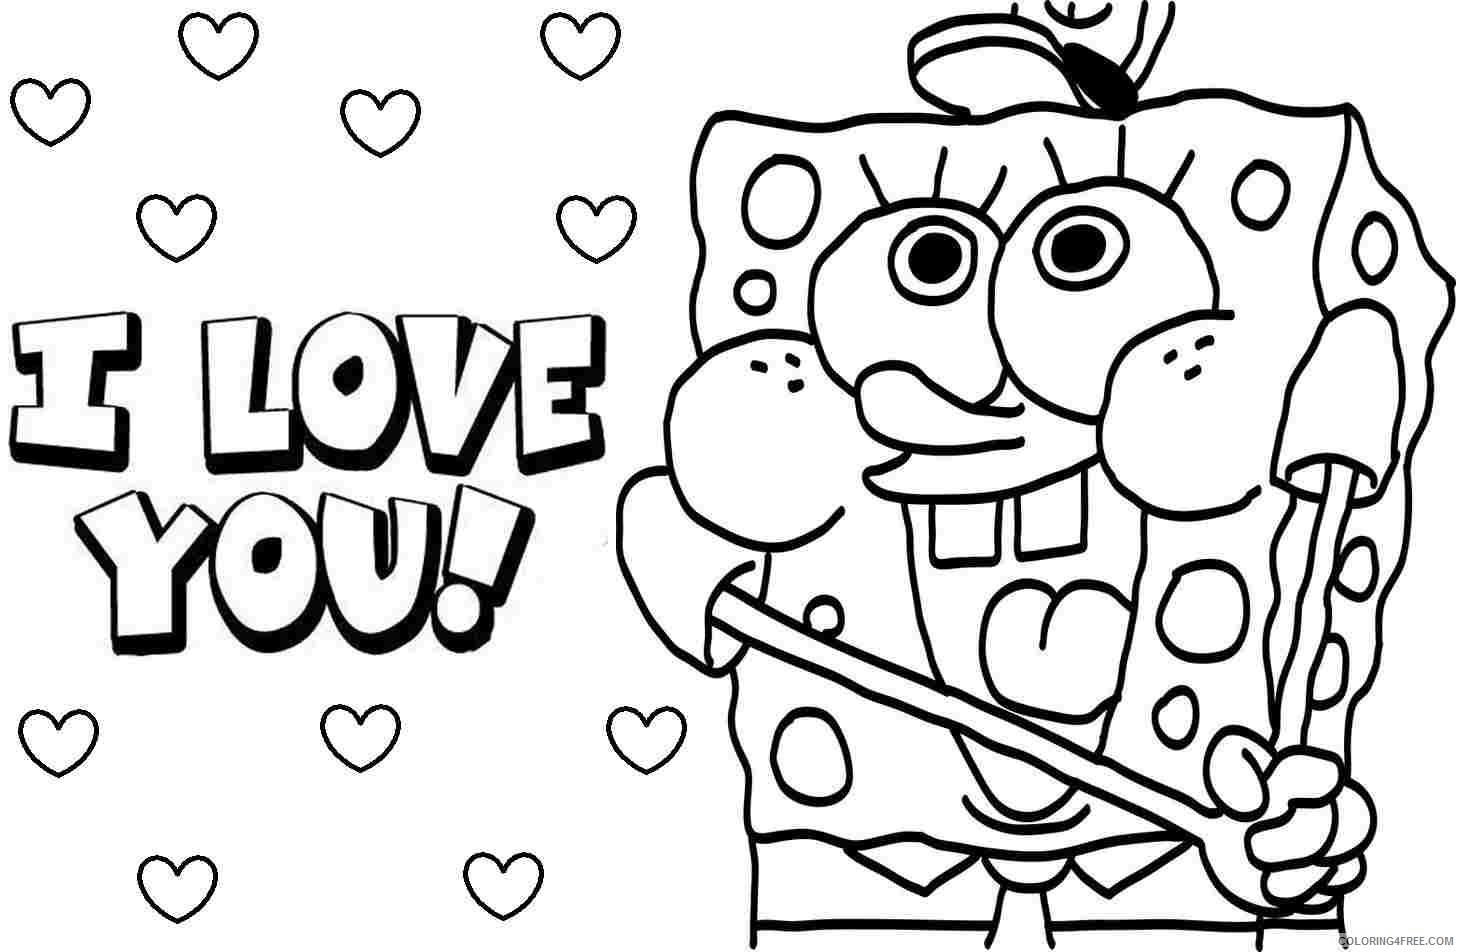 Butterfly Coloring Sheets: Spongebob Squarepants Coloring ... | 952x1460